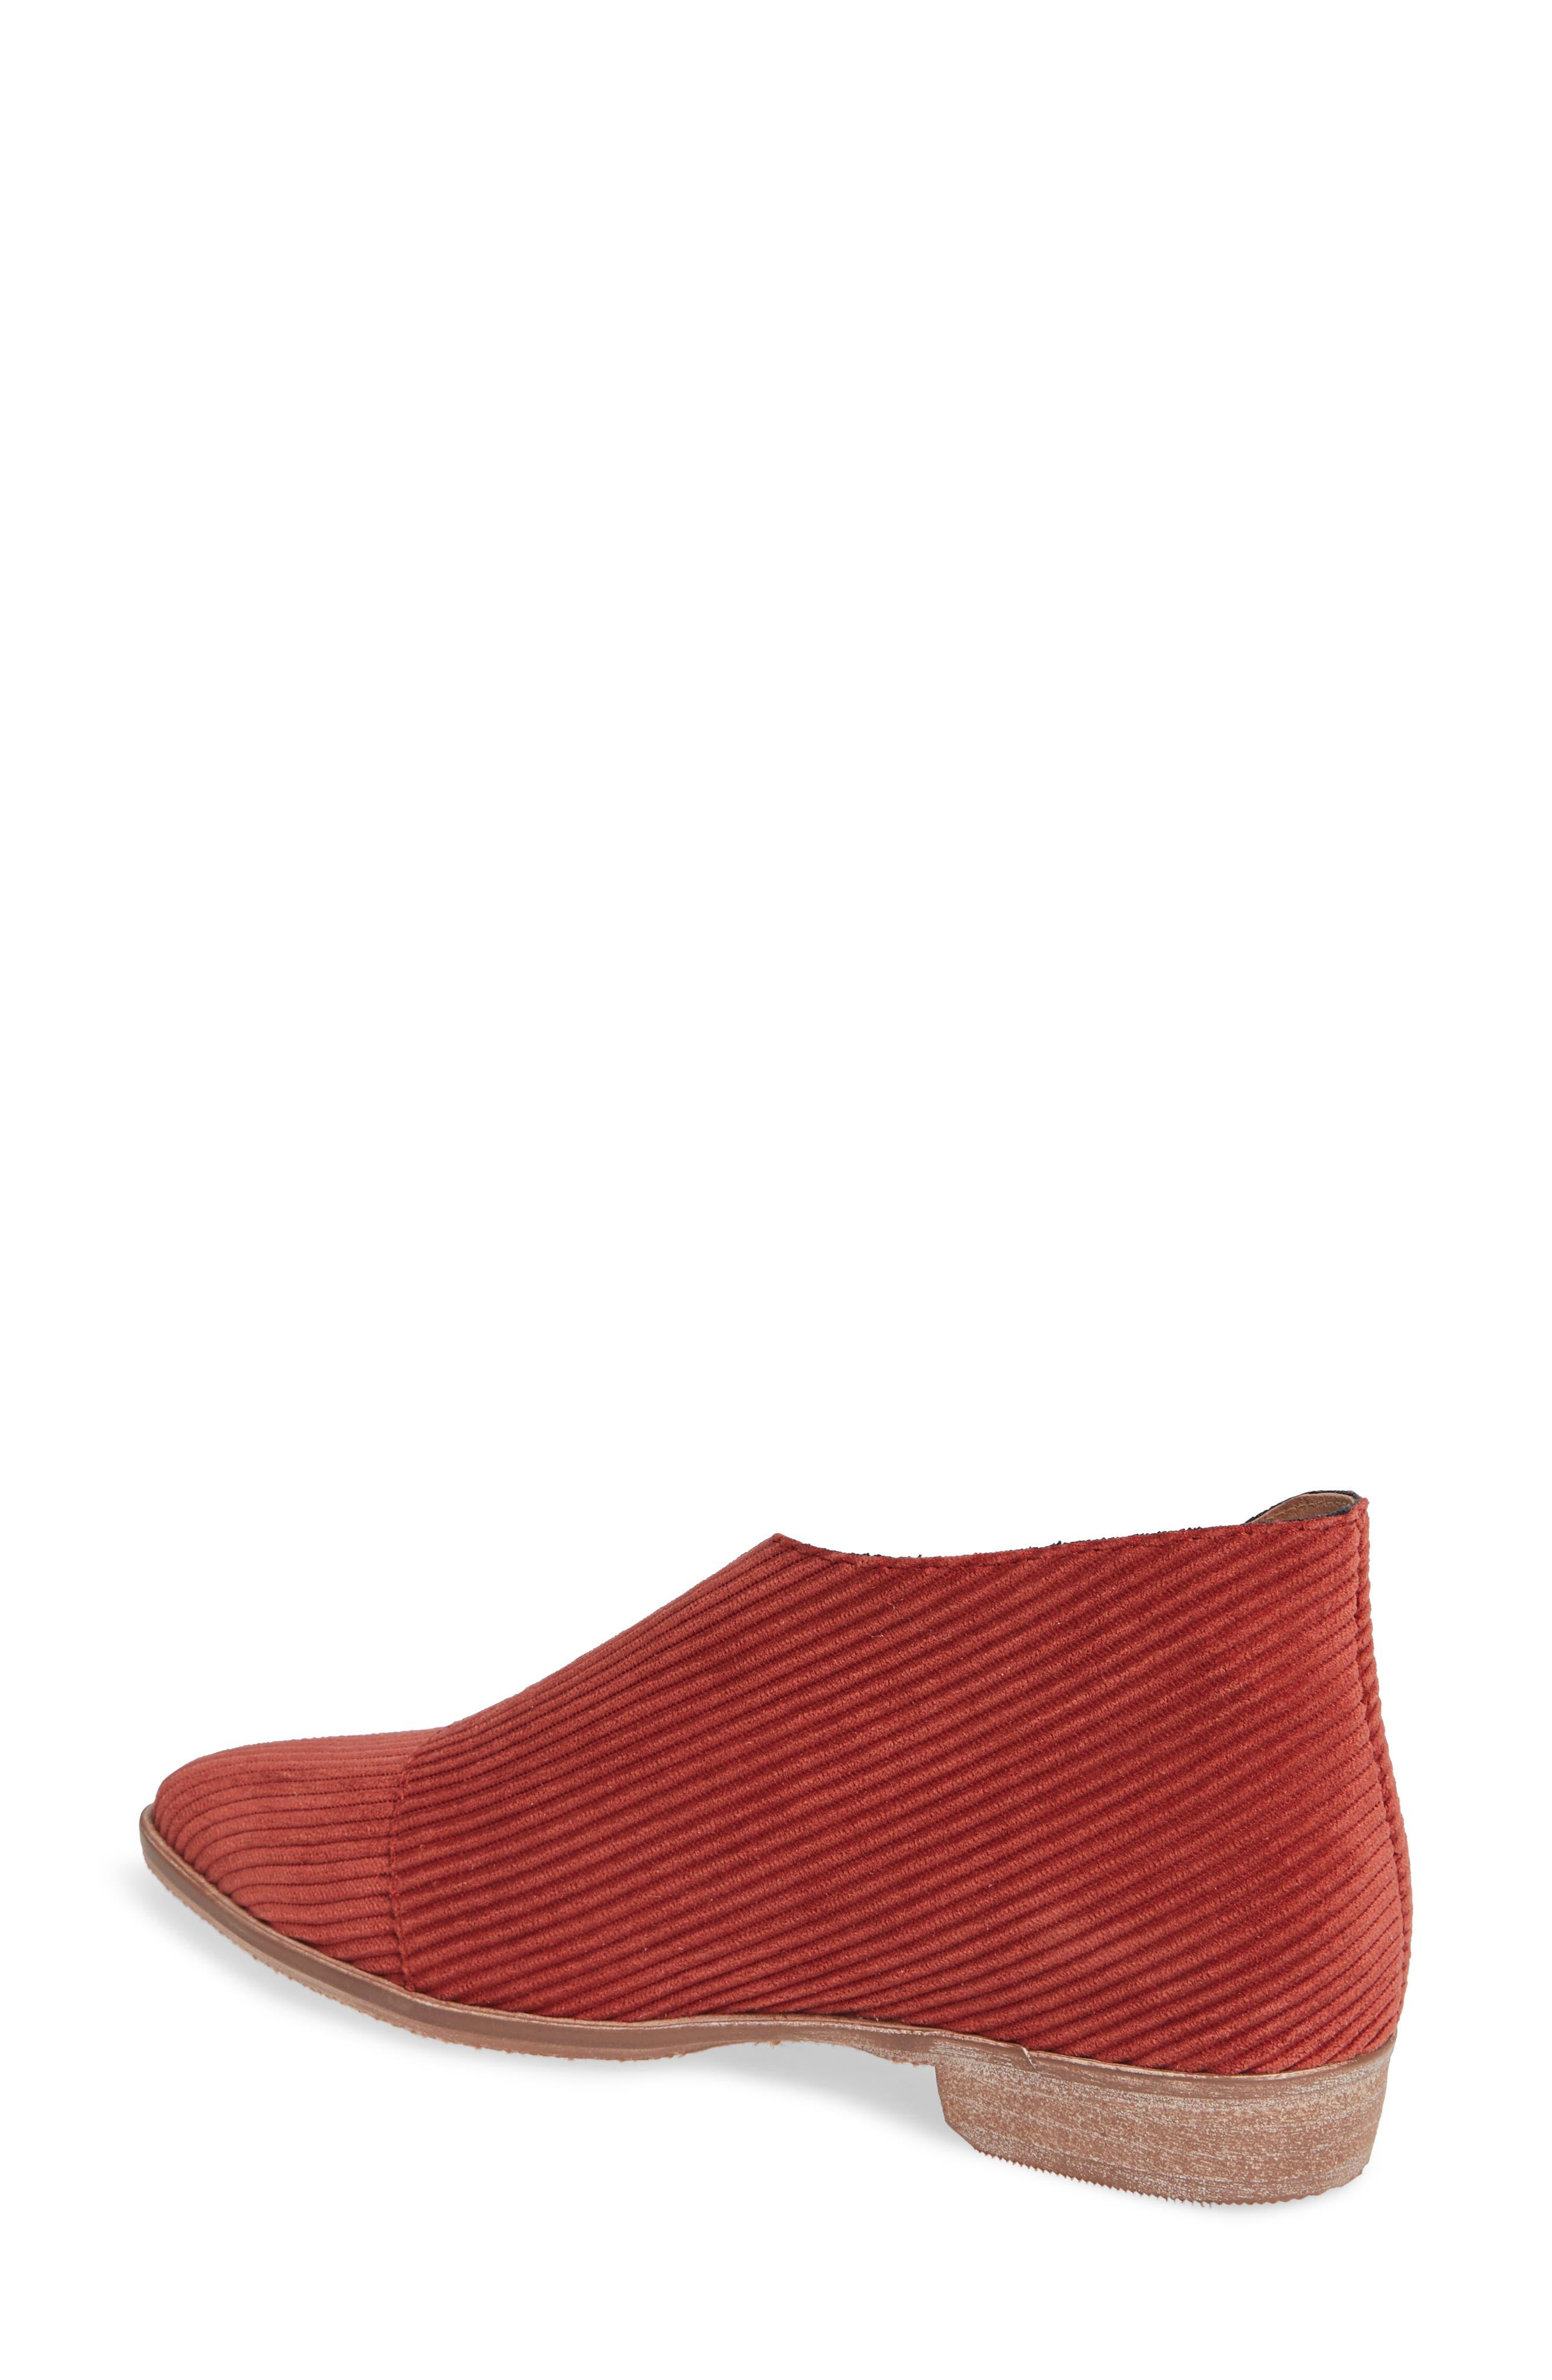 'Royale' Pointy Toe Flat,                             Alternate thumbnail 2, color,                             Burnt Orange